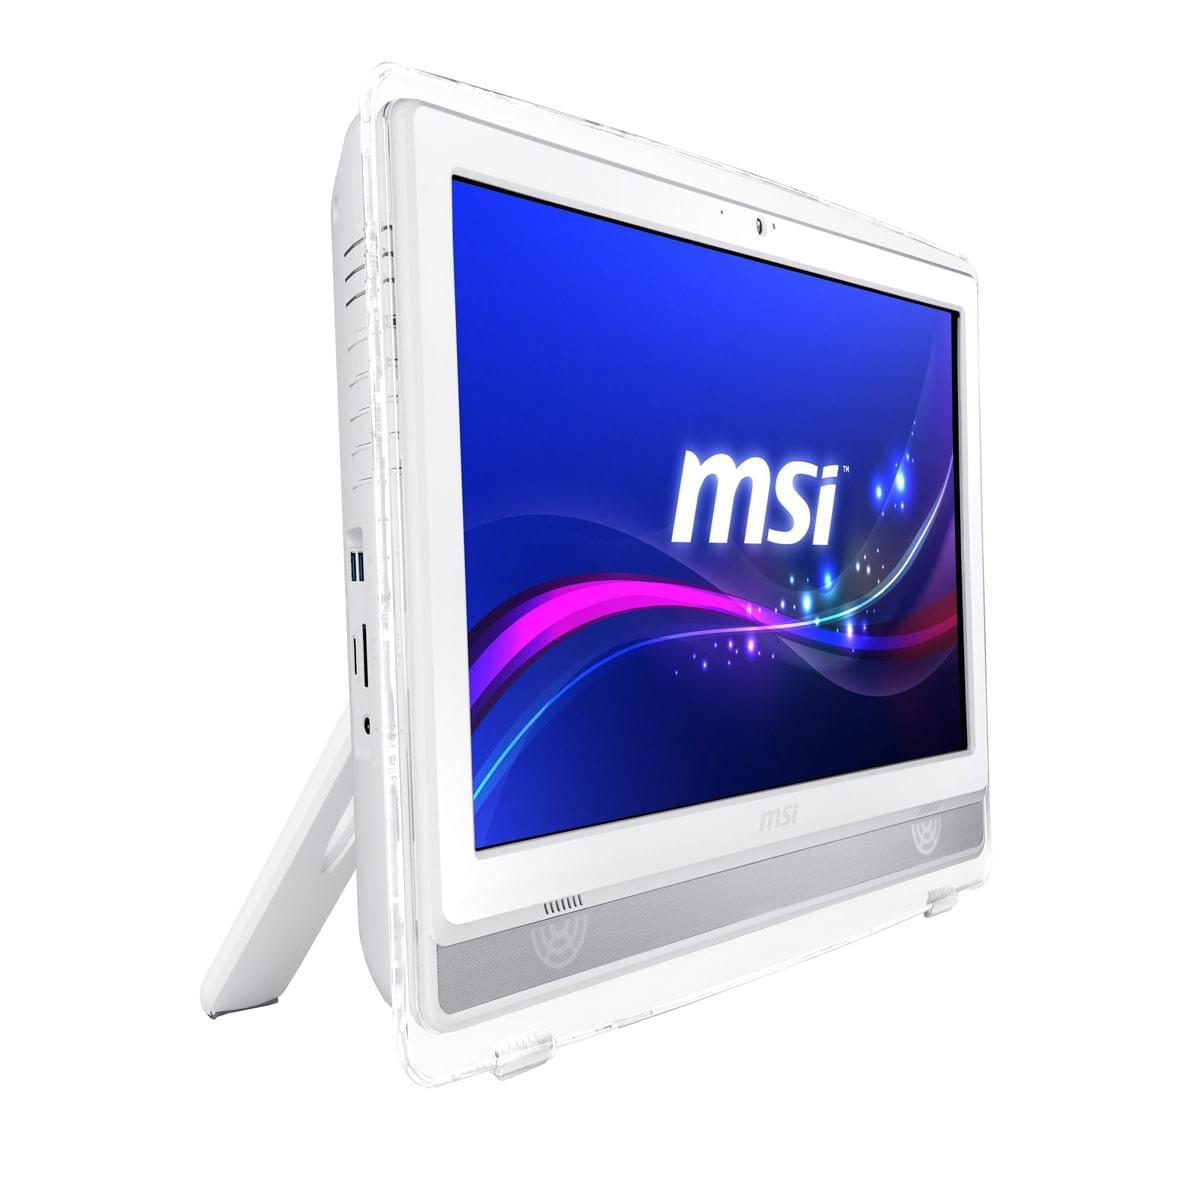 MSI AE2282-017EU (AE2282-017EU) - Achat / Vente All-In-One PC sur Cybertek.fr - 0